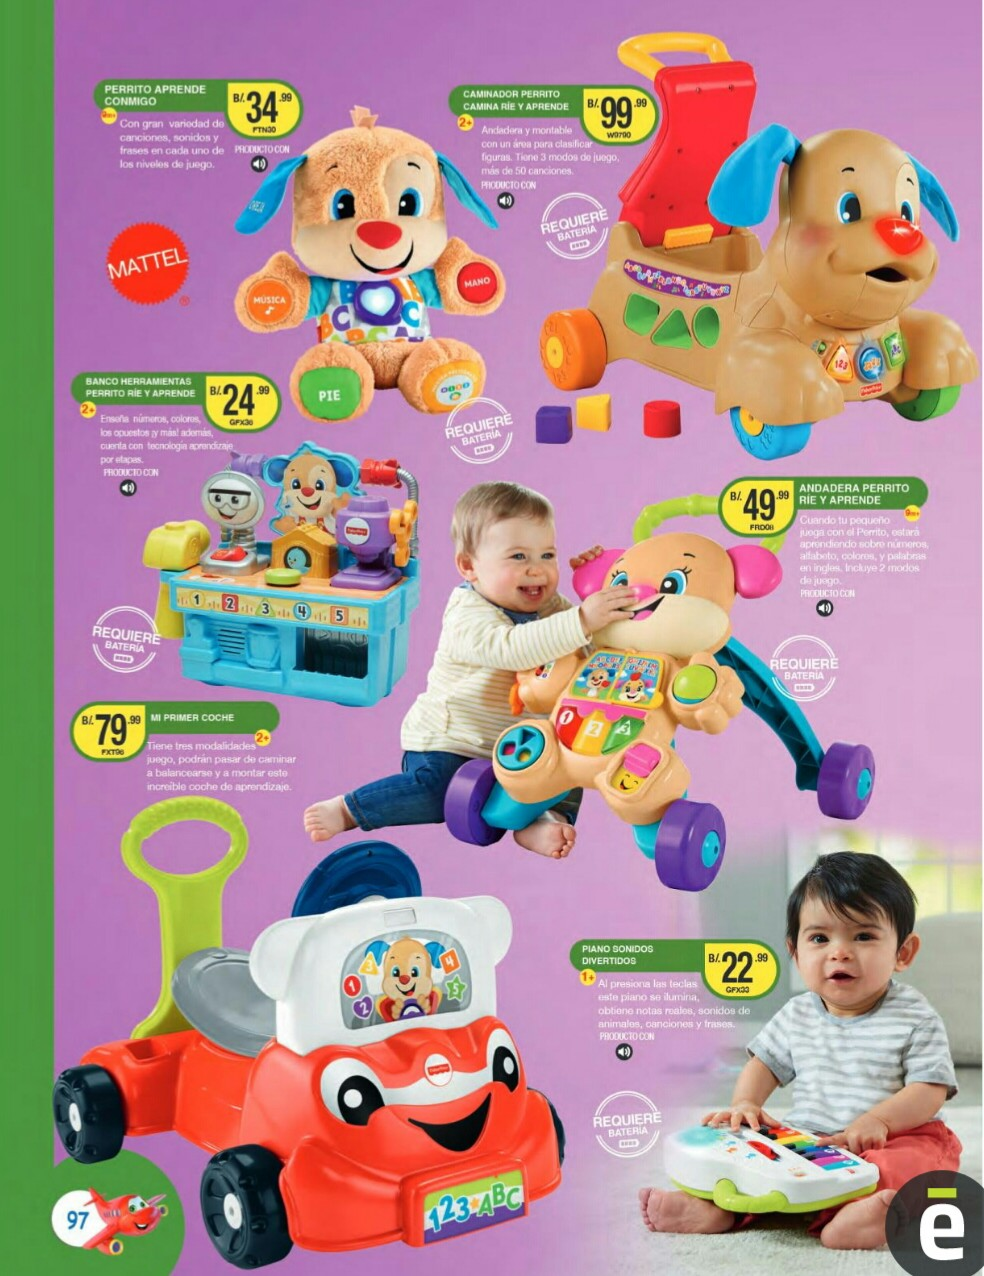 Catalogo juguetes Titan Toys 2019 p97